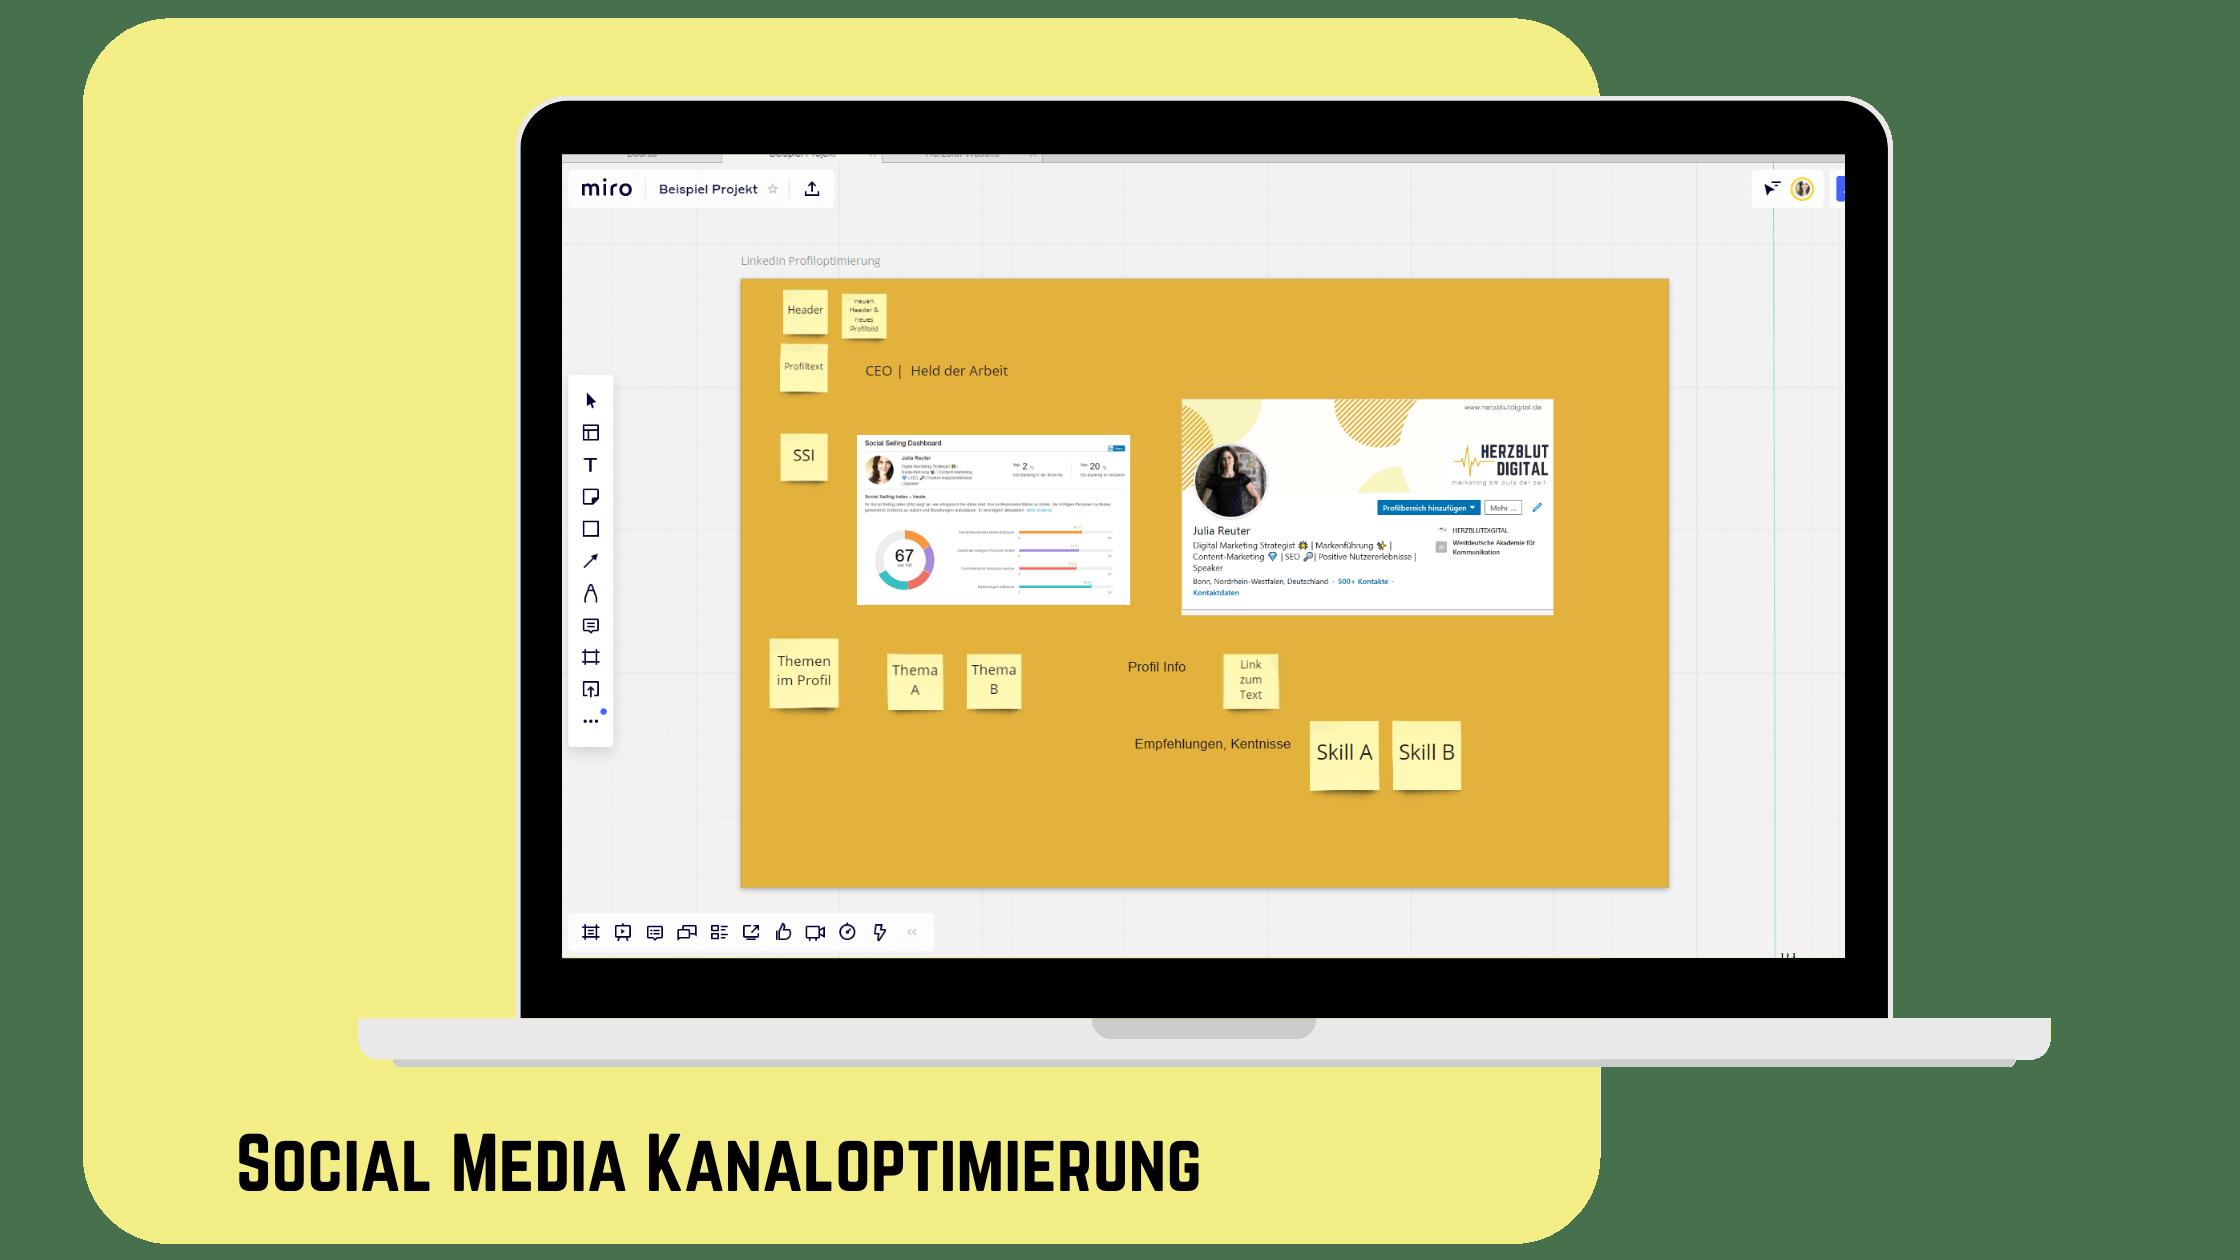 Social Media Kanaloptimierung